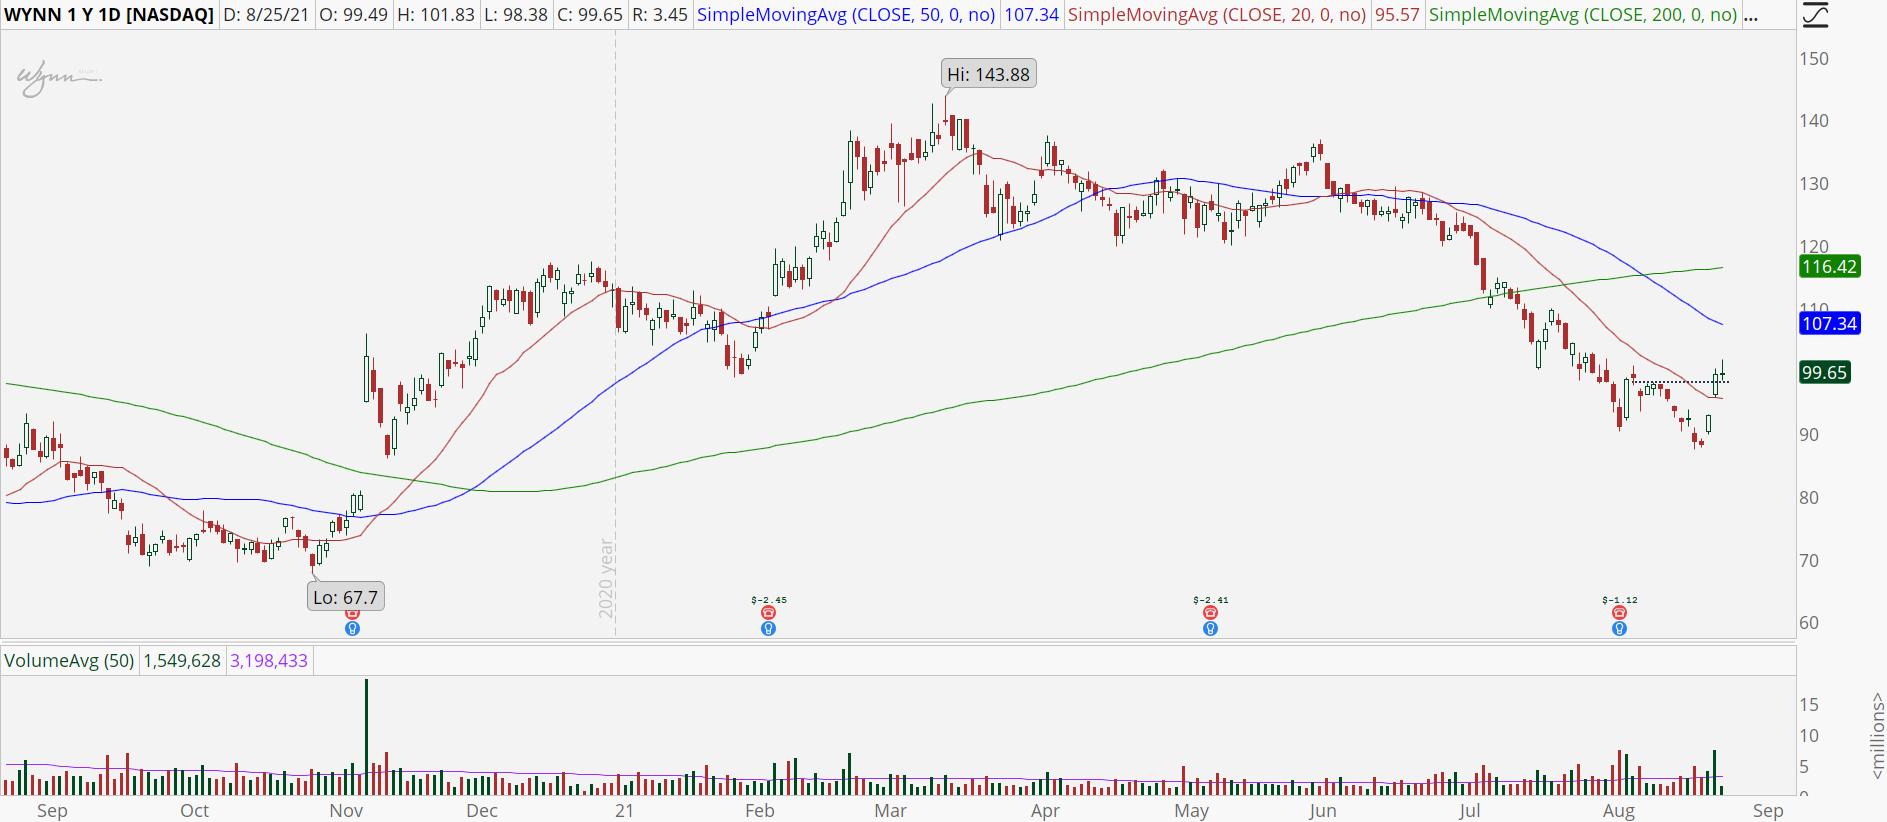 Wynn Resorts (WYNN) stock chart with breakout